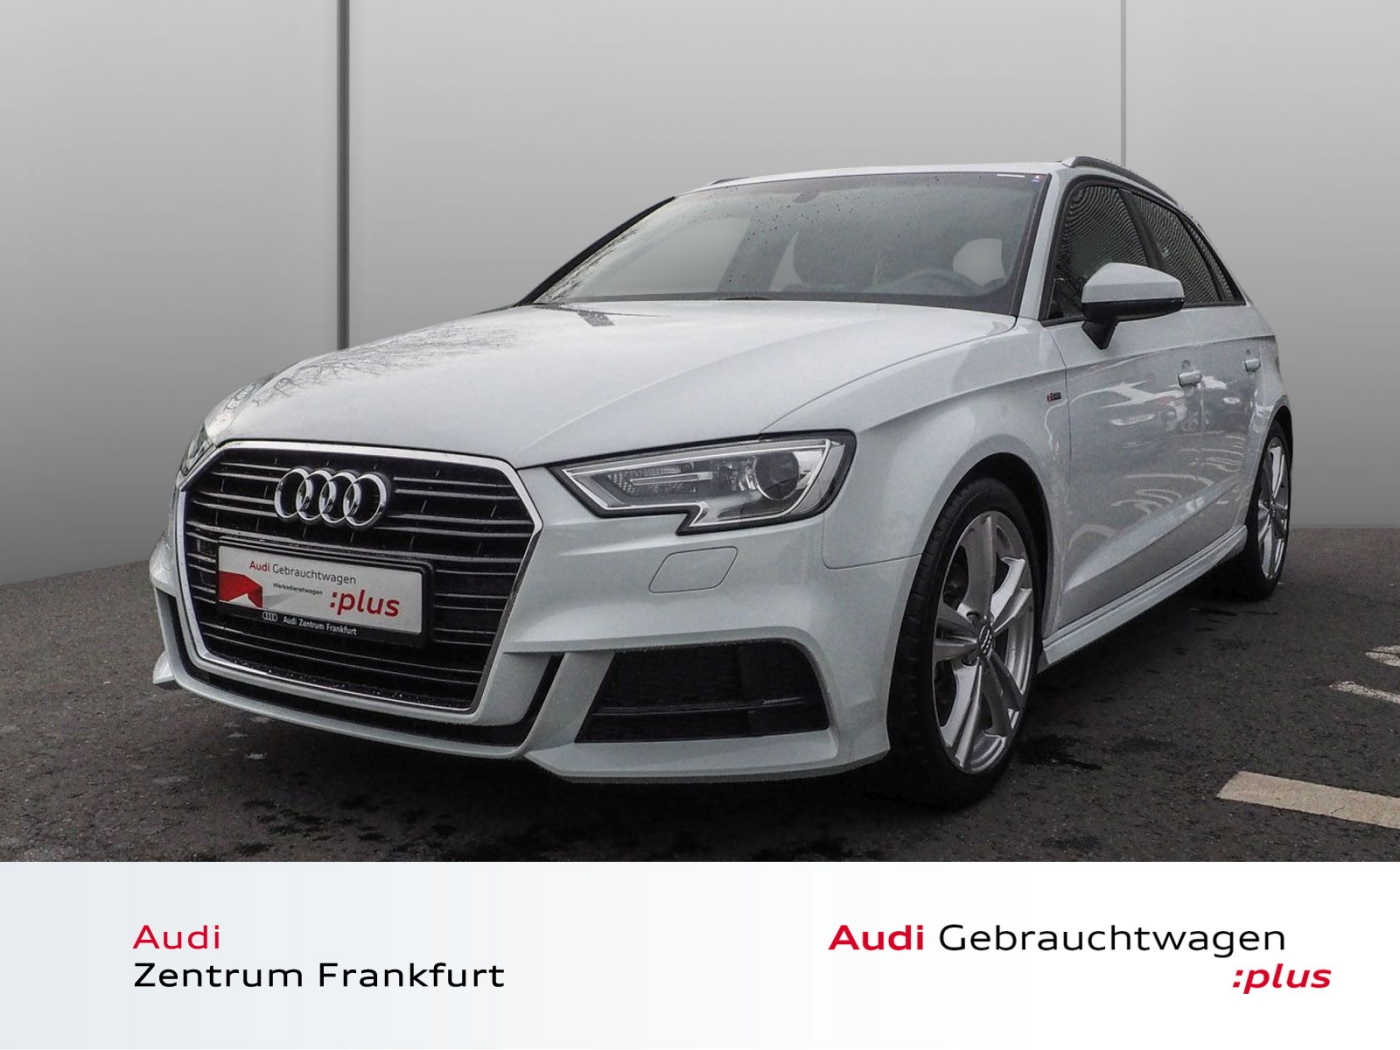 Audi A3 Sportback 30 TFSI sport Navi Xenon Tempomat P, Jahr 2019, petrol